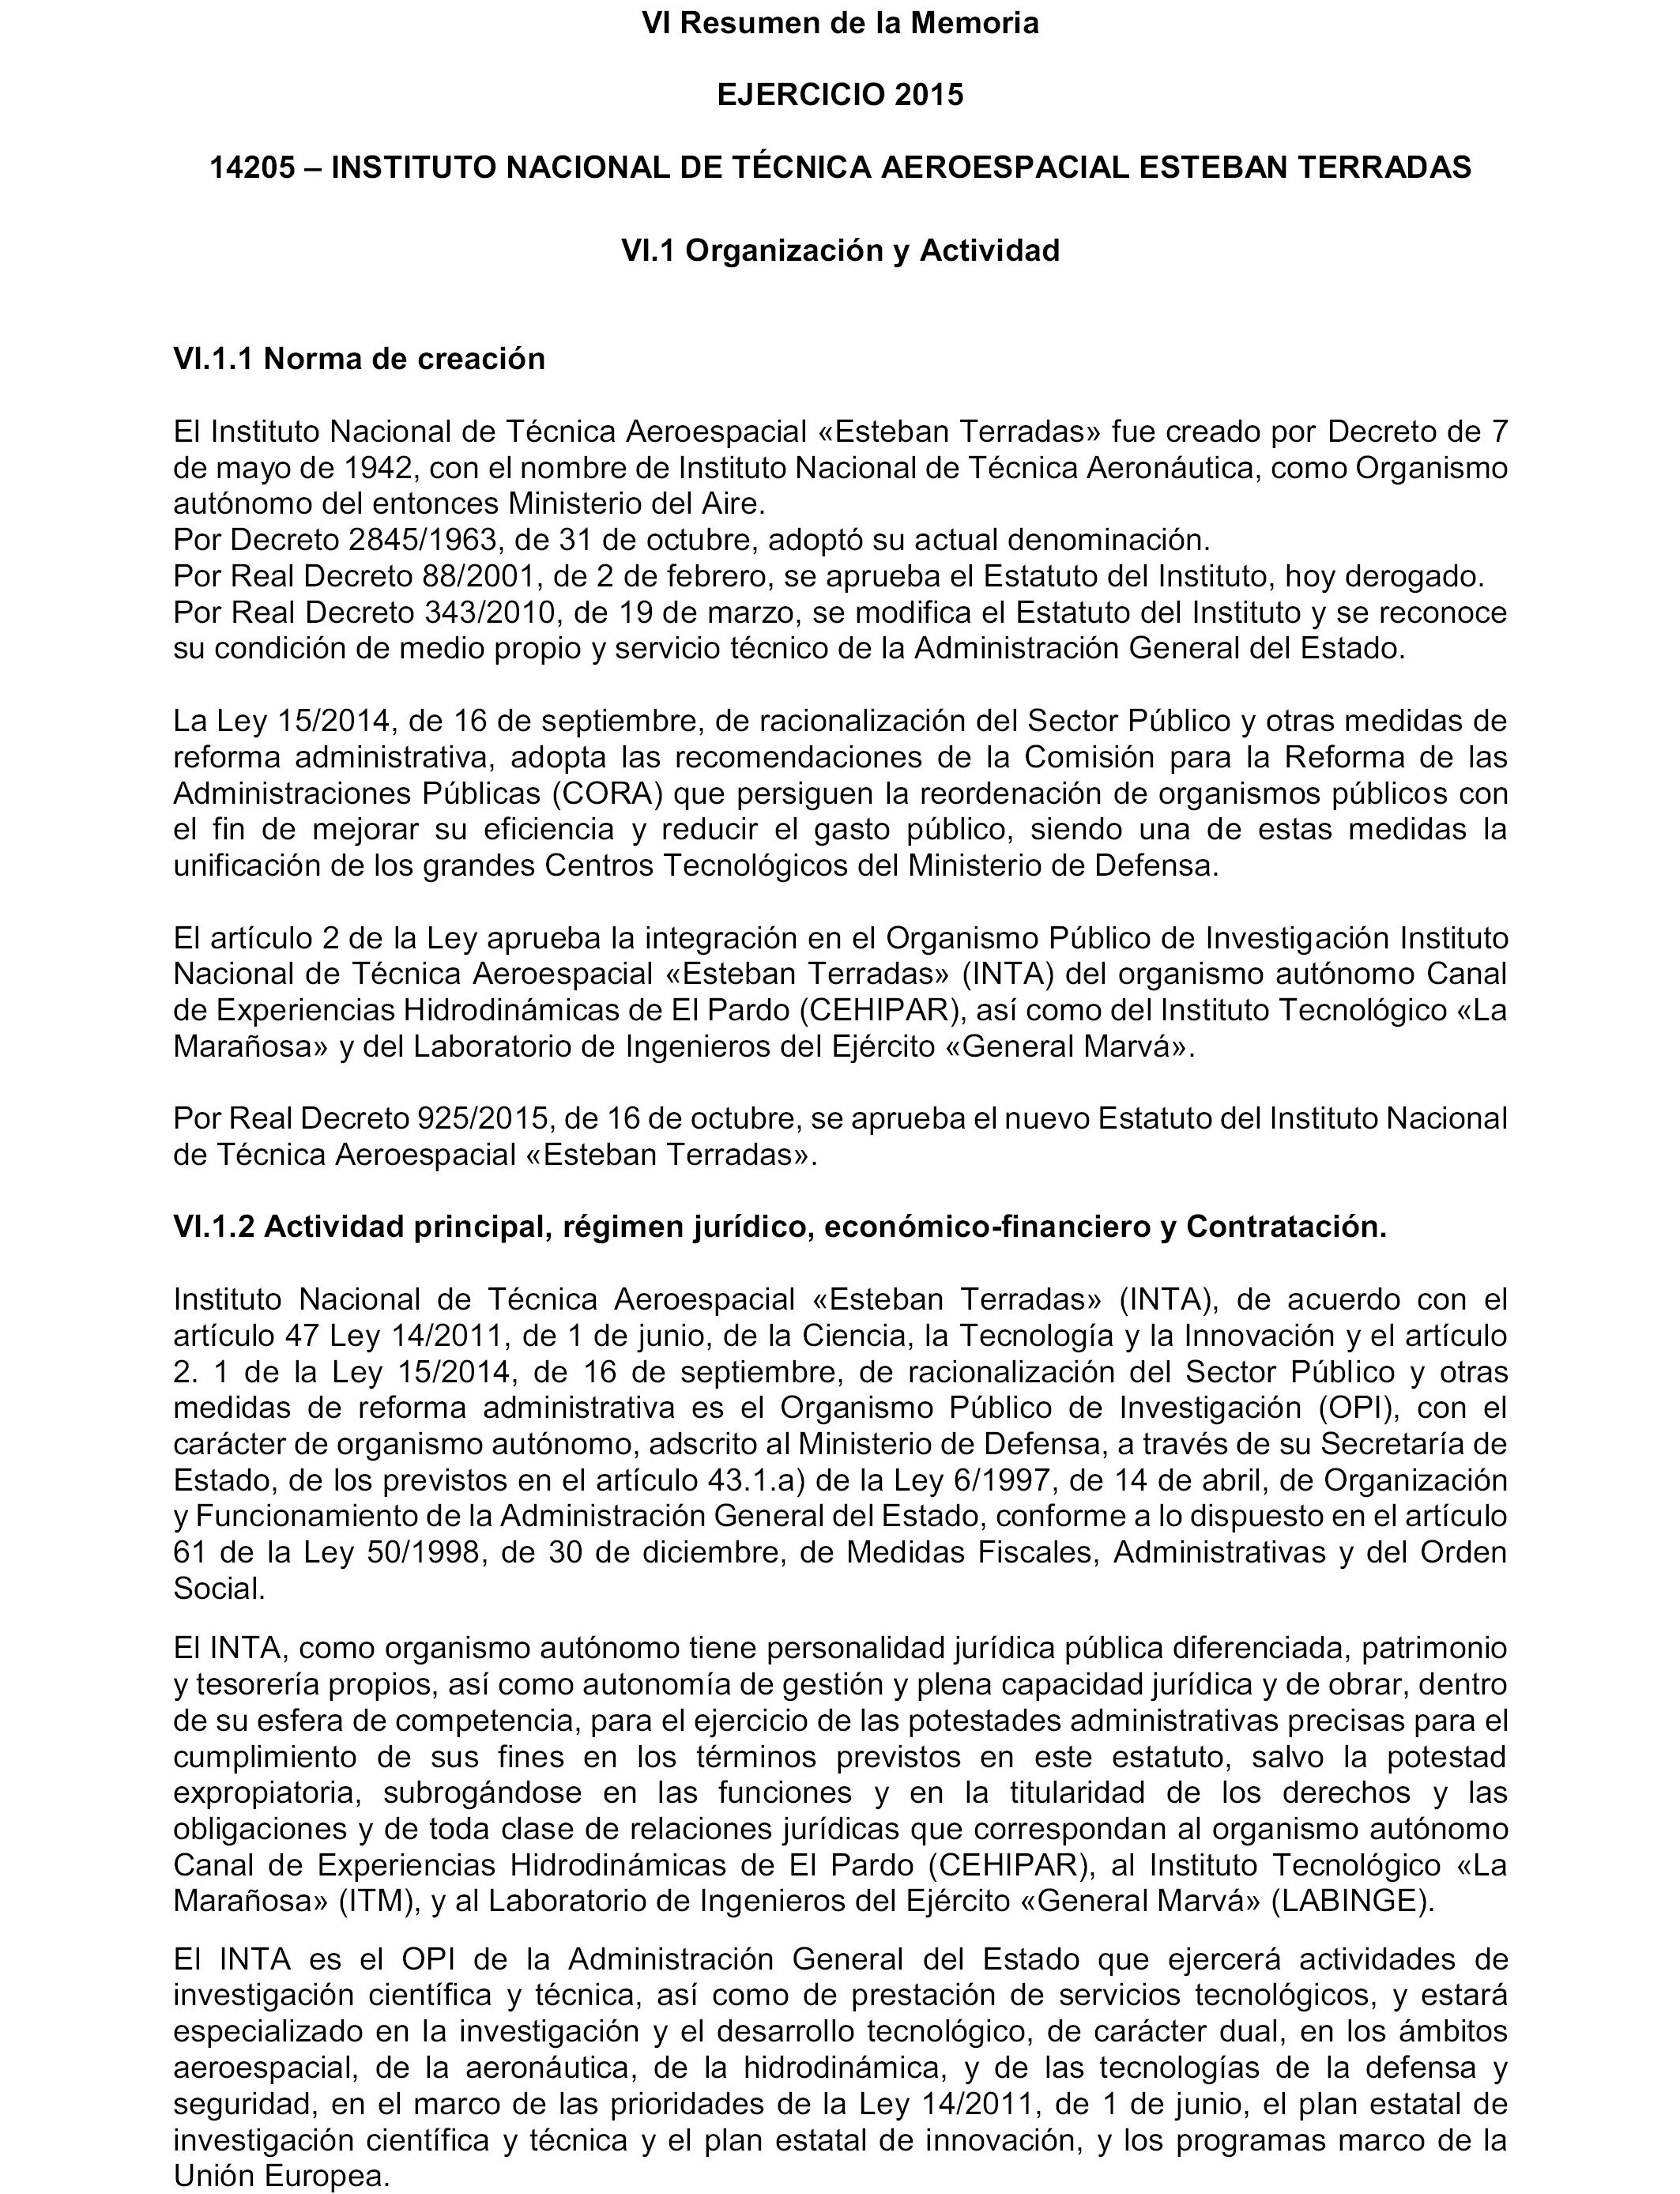 BOE.es - Documento BOE-A-2016-8471